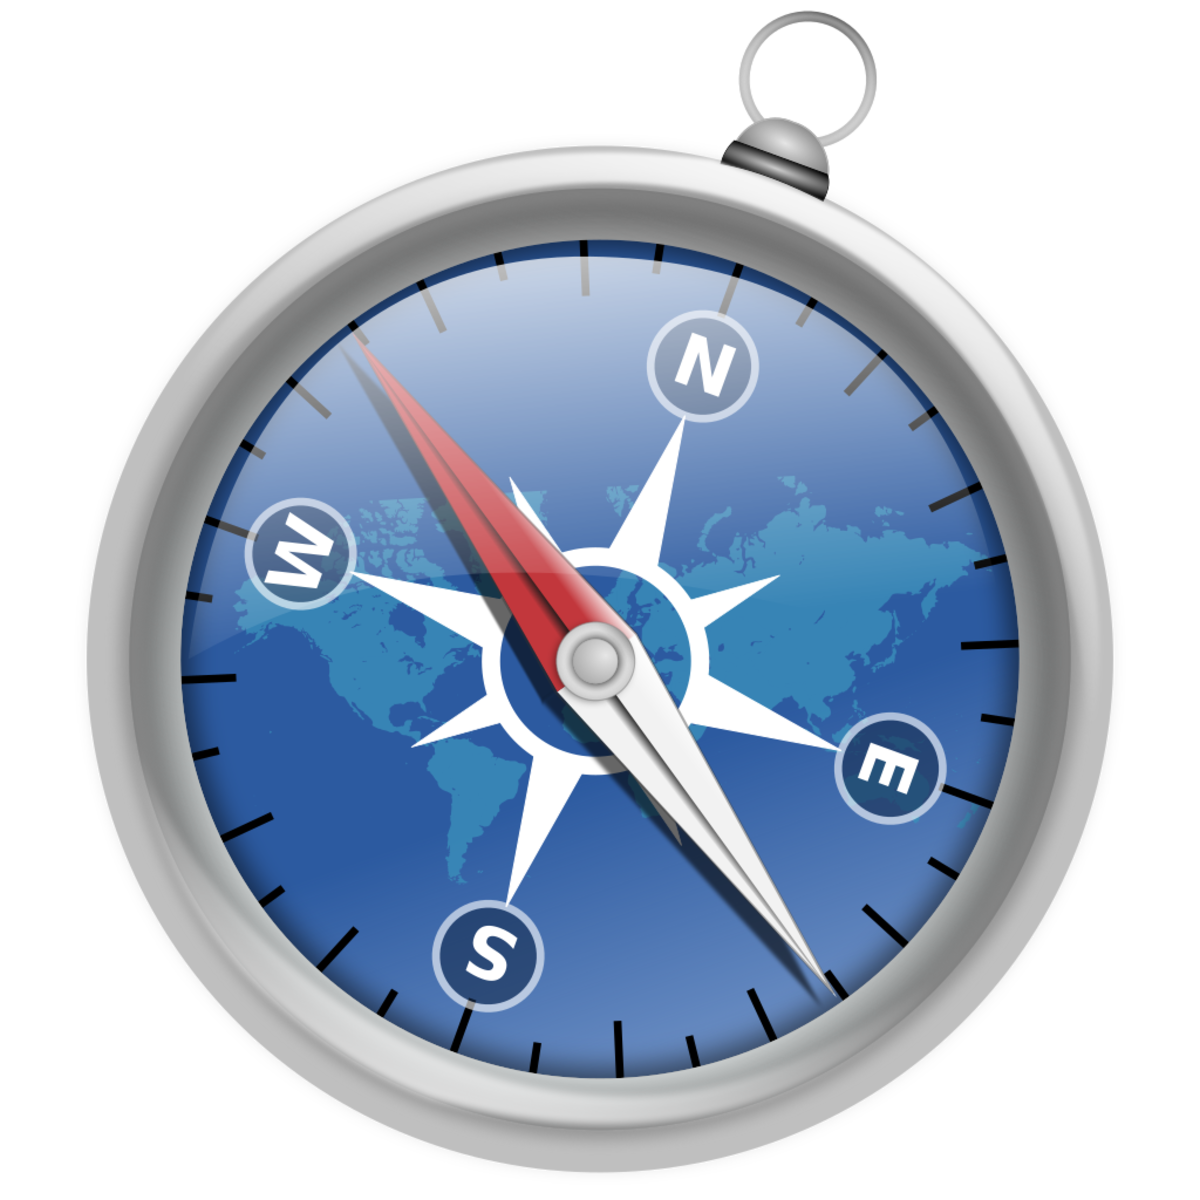 1024px-Compass_icon_matte.svg